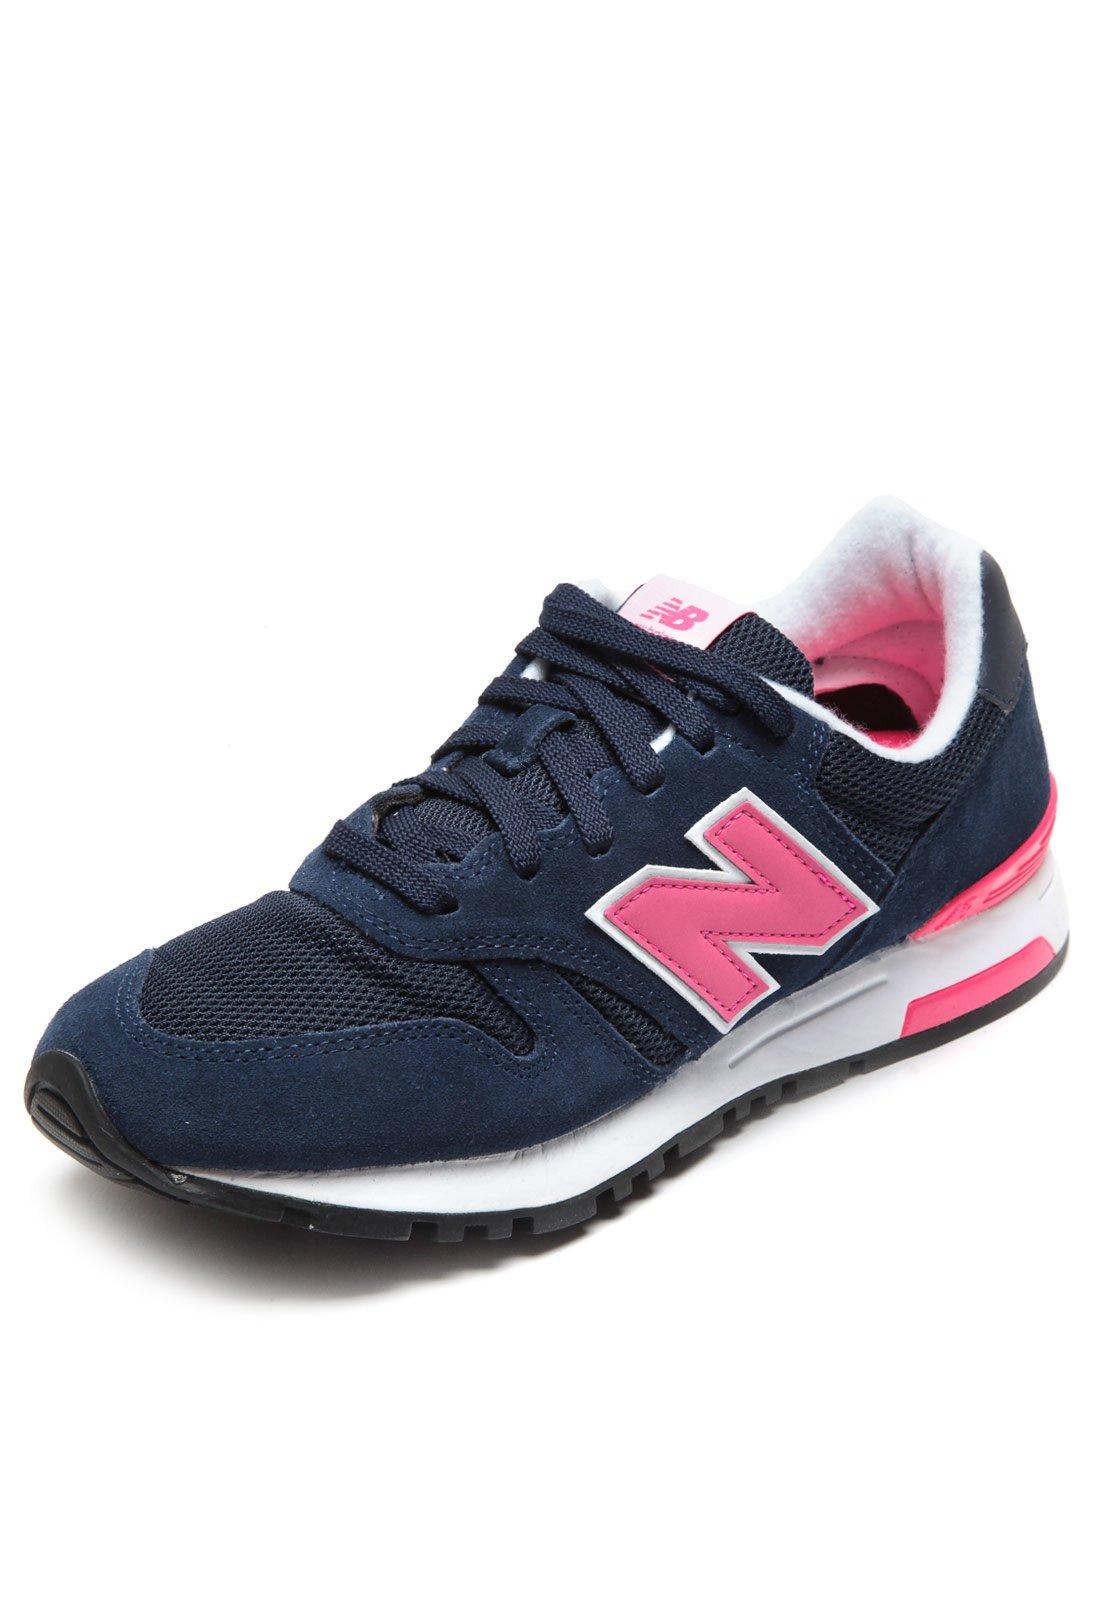 new balance azul marinho e rosa